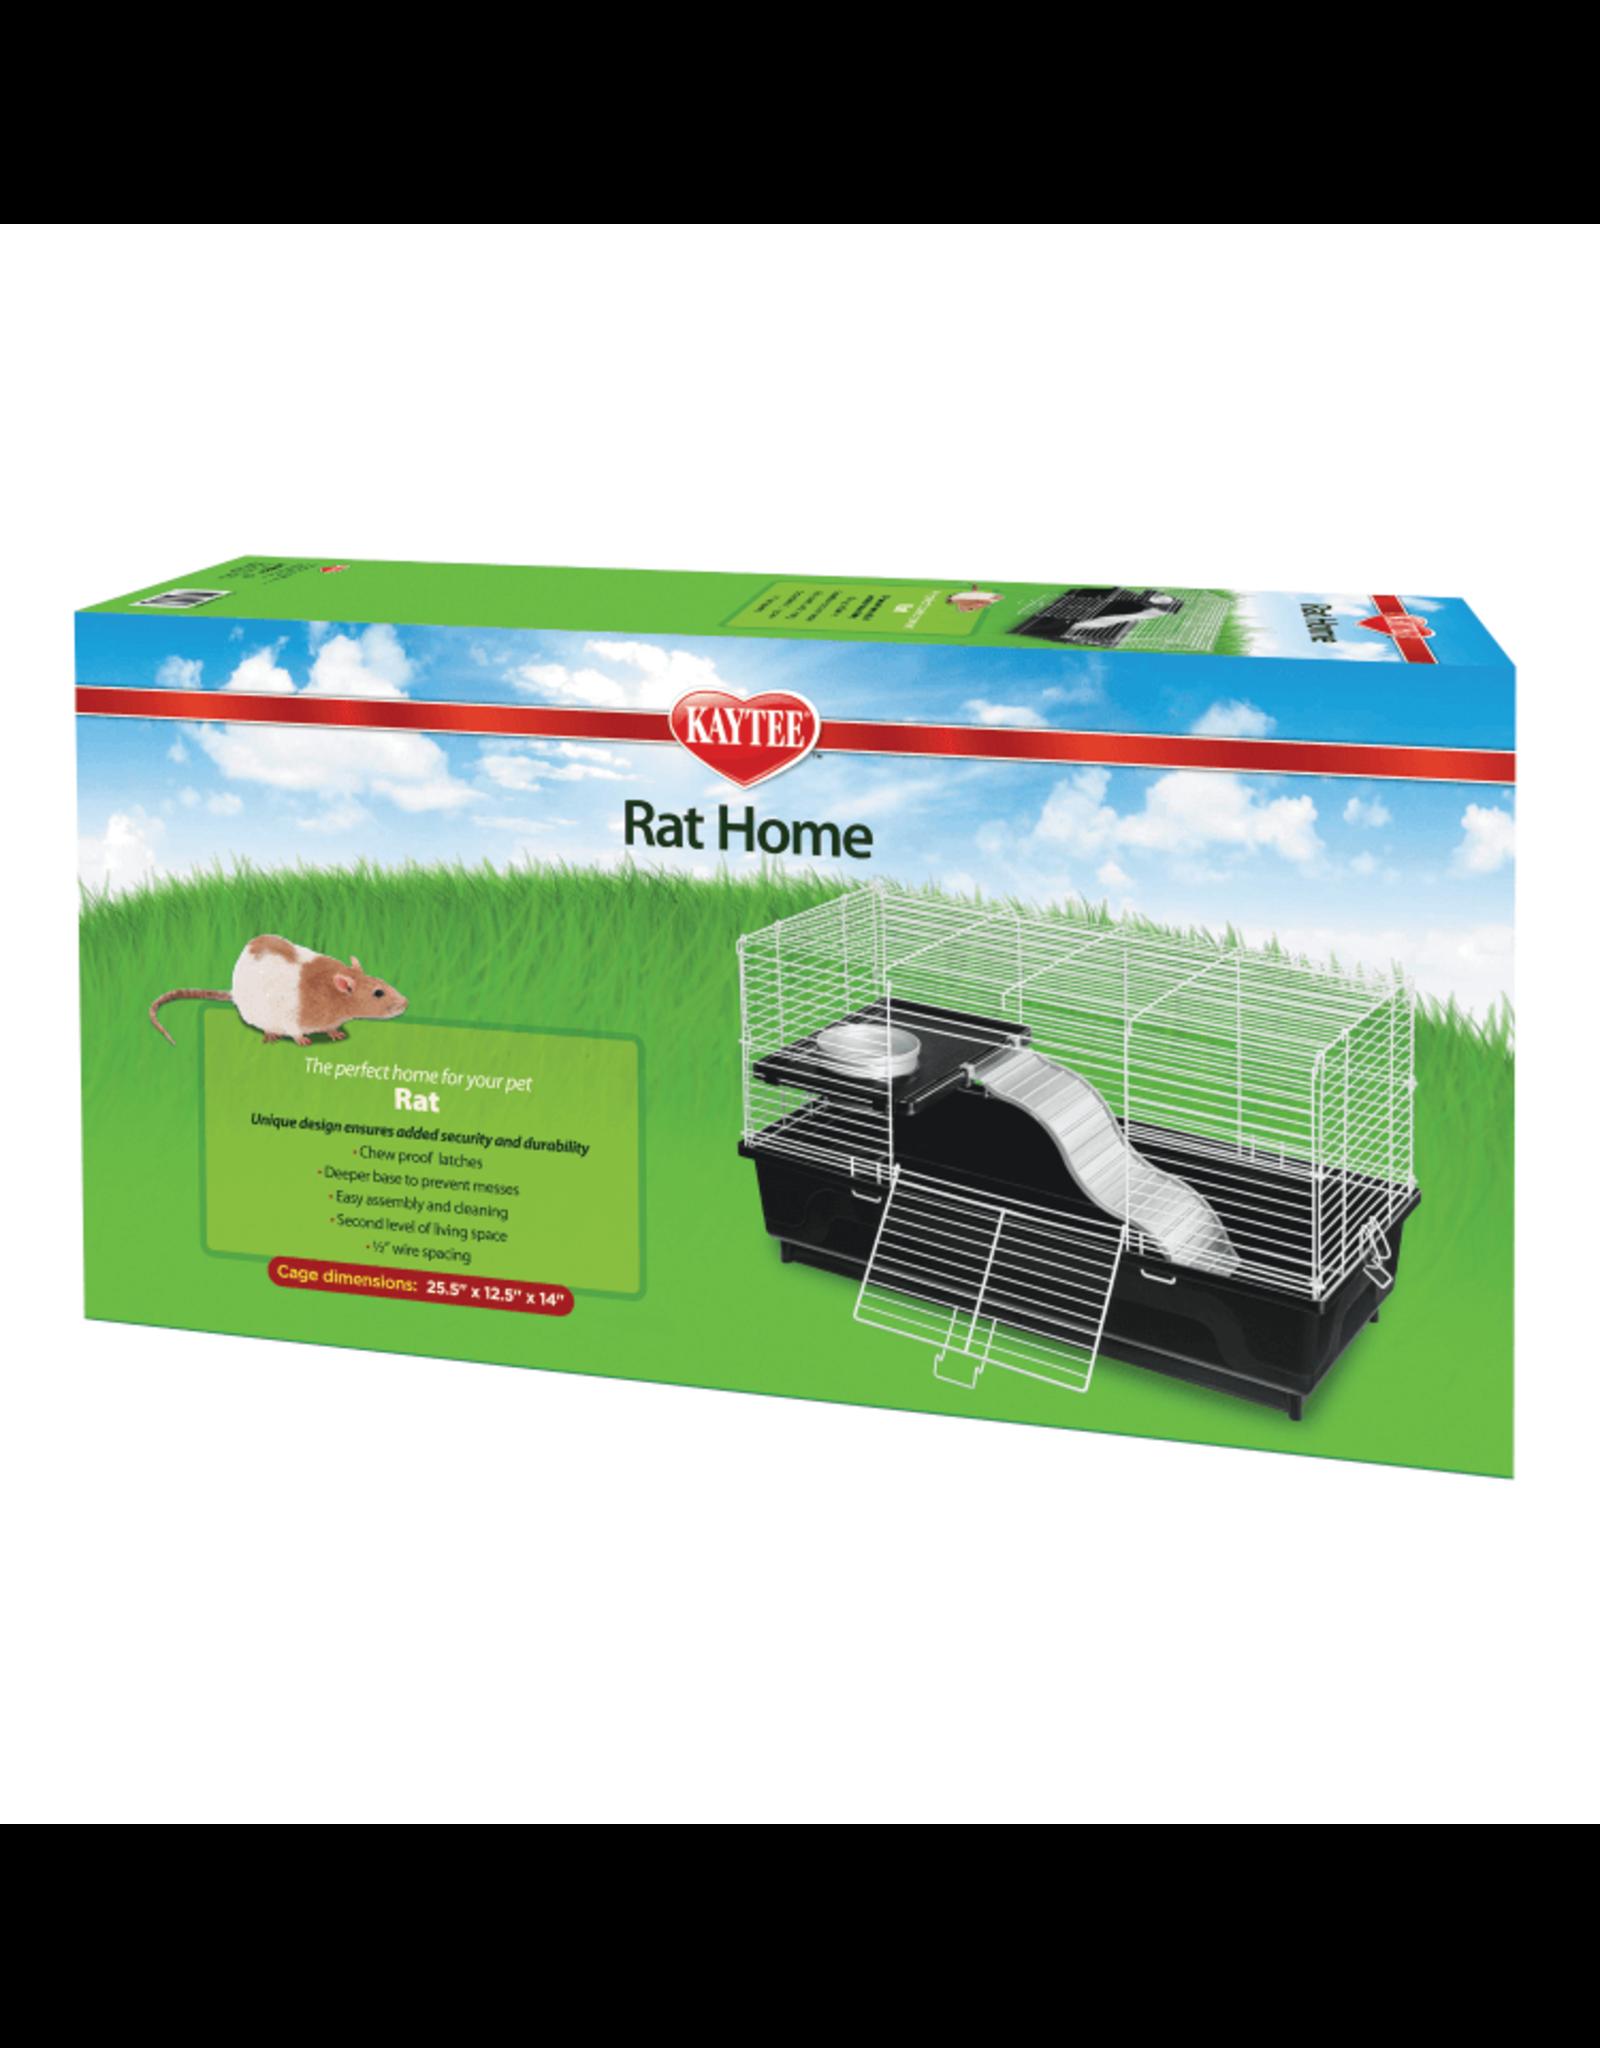 Kaytee/Super Pet KAYTEE My First Home for Pet Rat